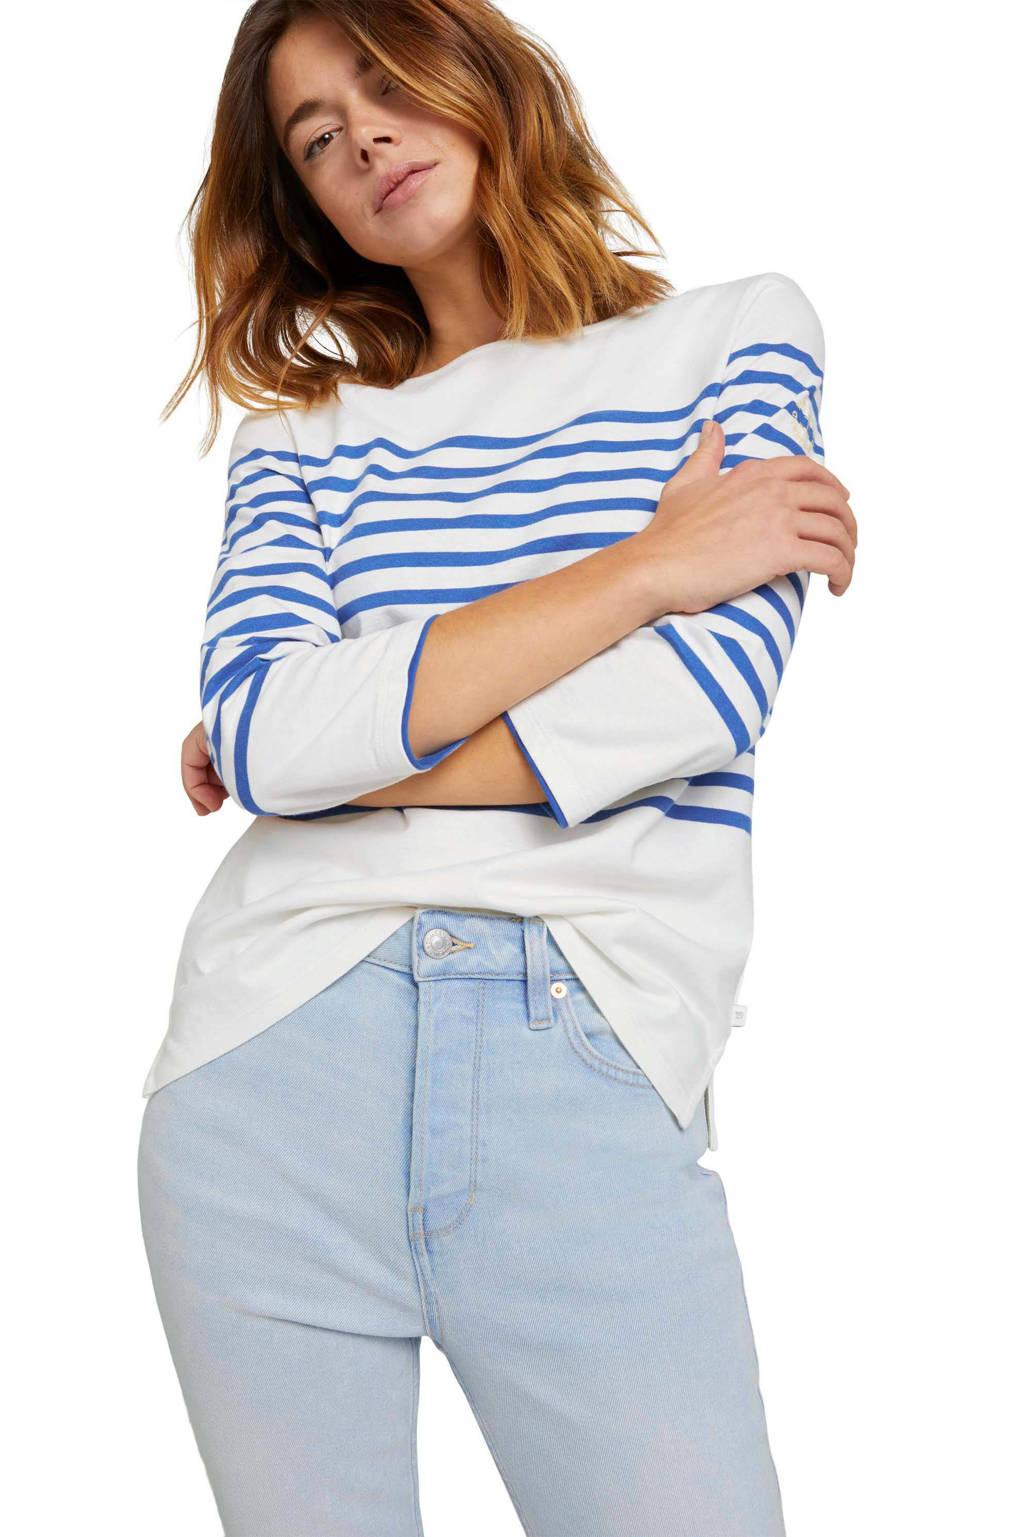 Tom Tailor Denim gestreepte top wit/blauw, Wit/blauw